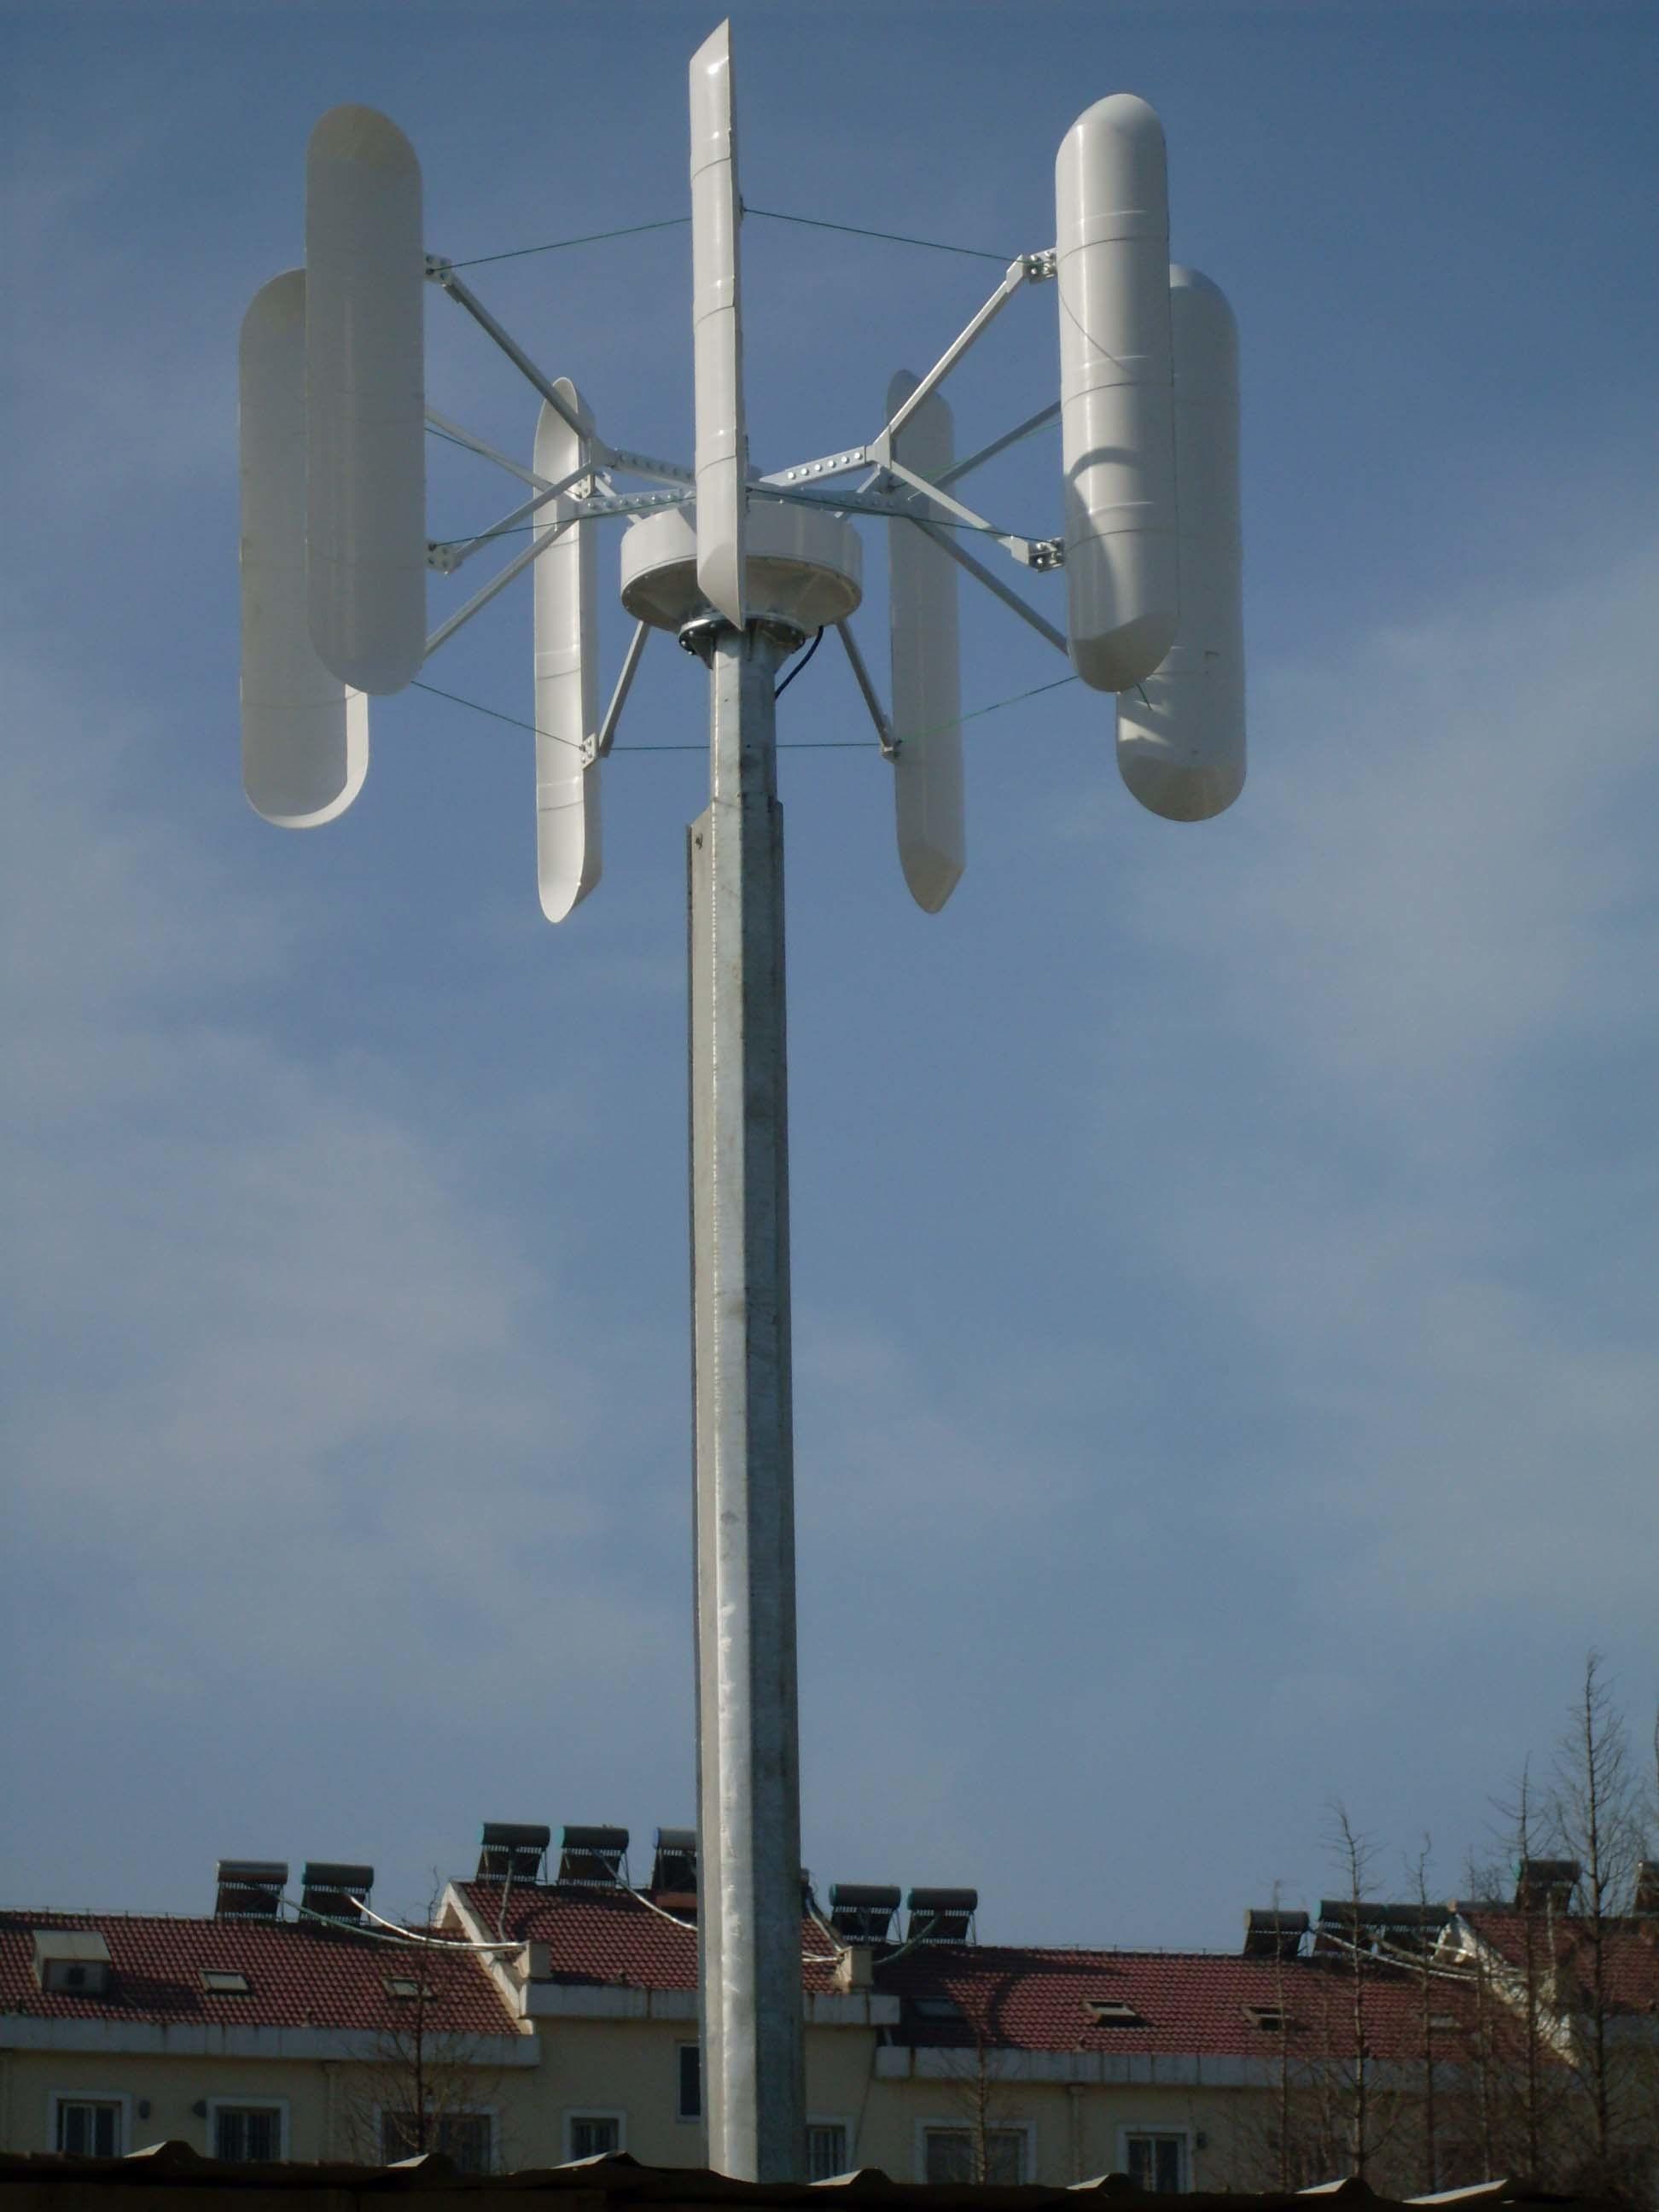 Vertical Axis Wind Turbine Generator/Alternator